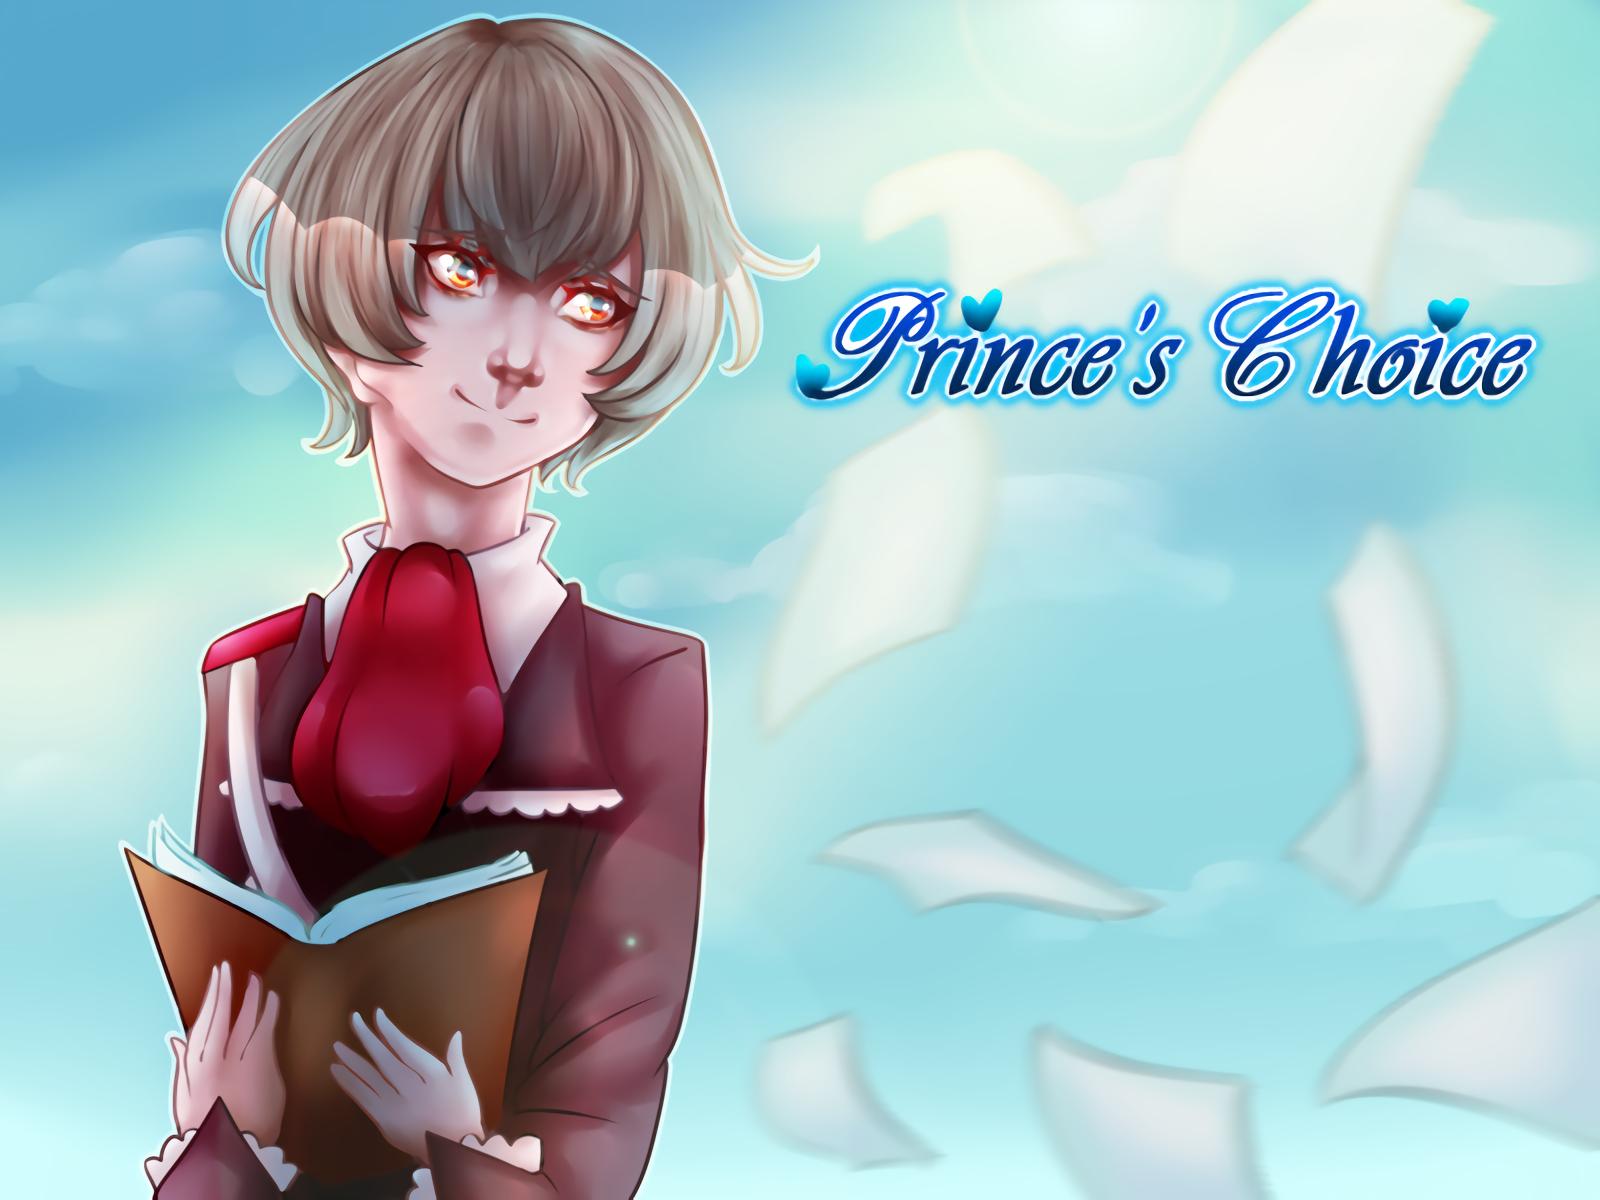 Prince's Choice [Otome Game DEMO] by MikomiKisomi